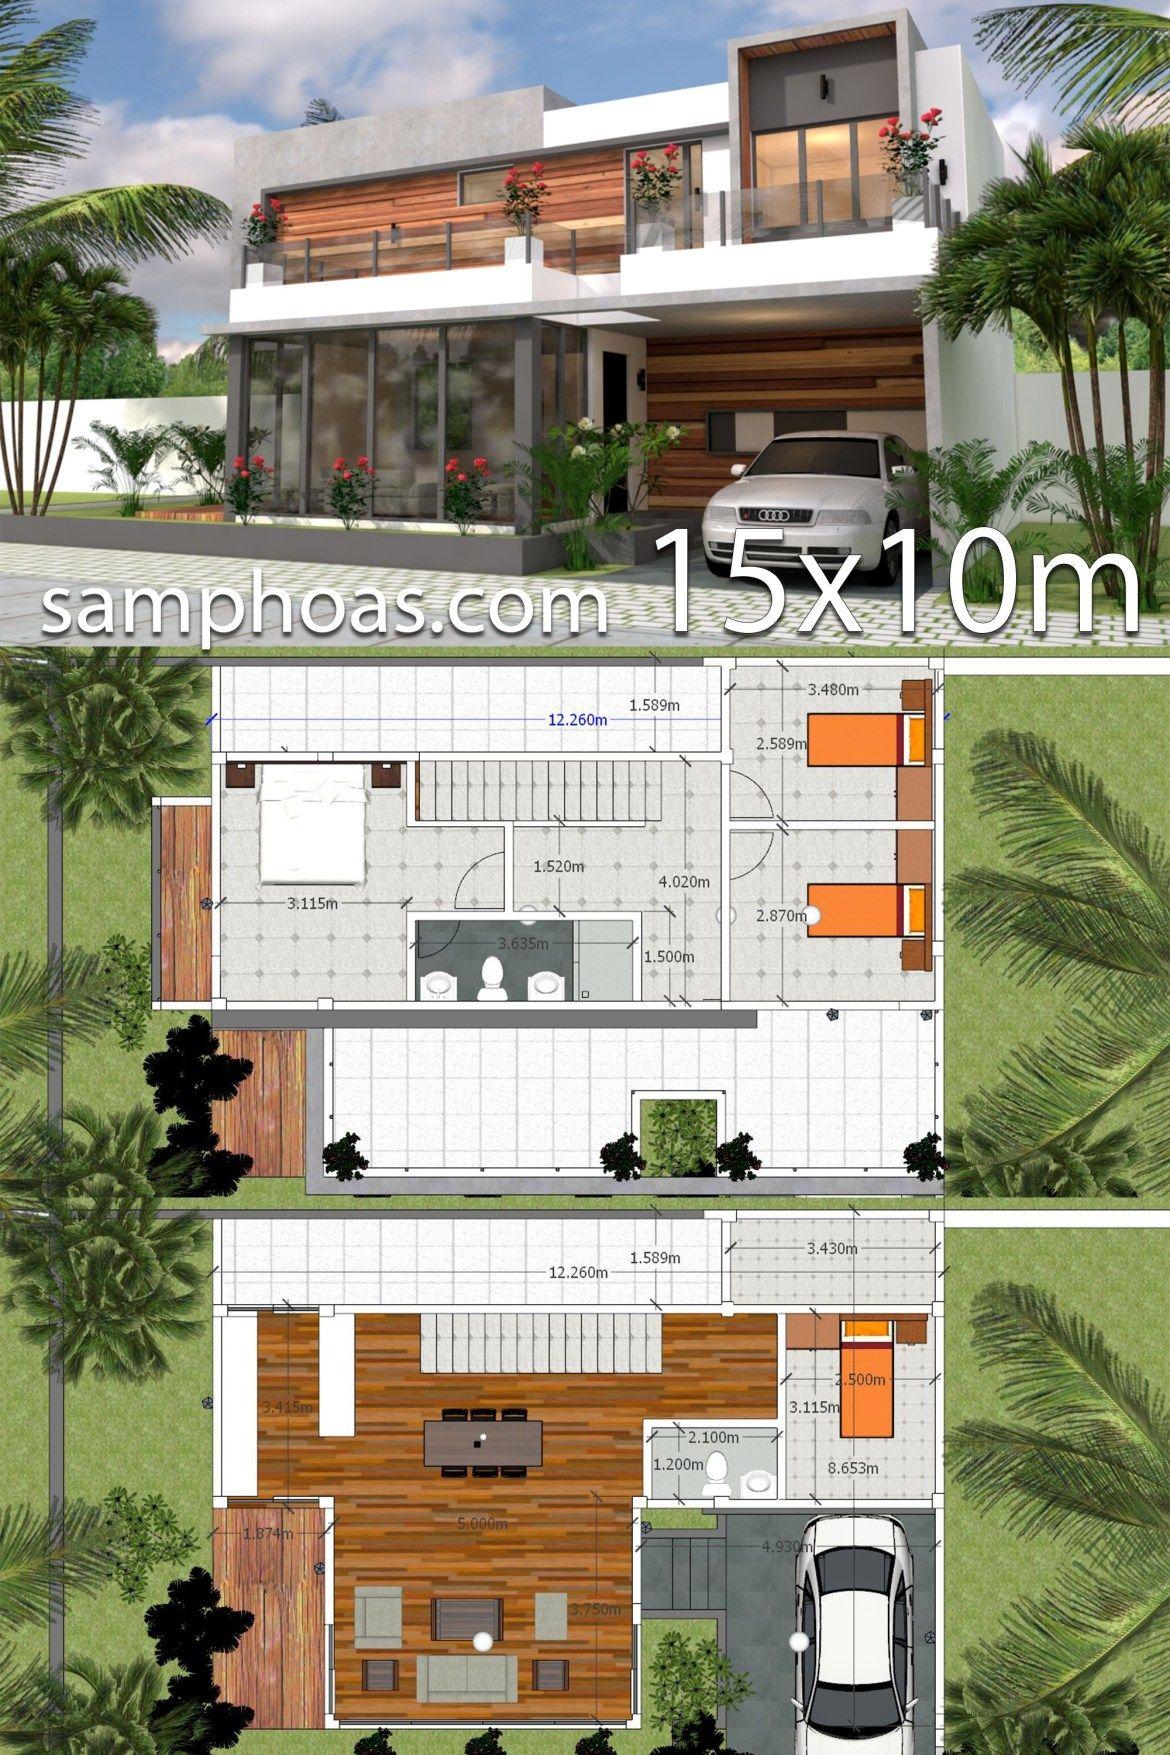 Plan 3d Home Design 15x10m 4bedrooms Samphoas Plansearch House Plans Modern House Floor Plans 3d Home Design